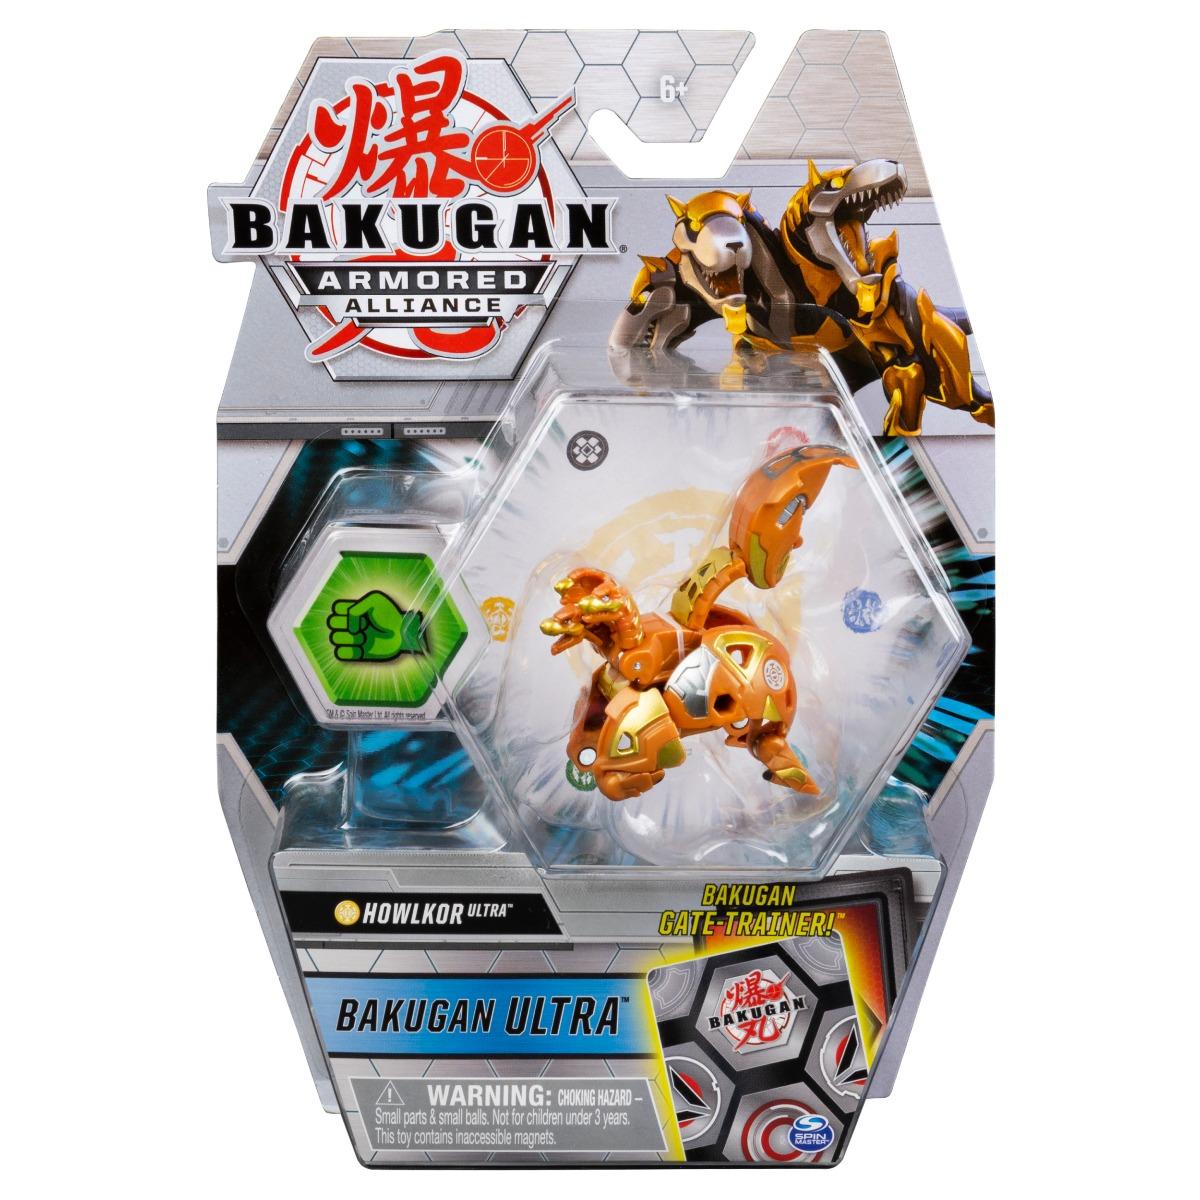 Figurina Bakugan Ultra Armored Alliance, Howlkor, 20124298 imagine